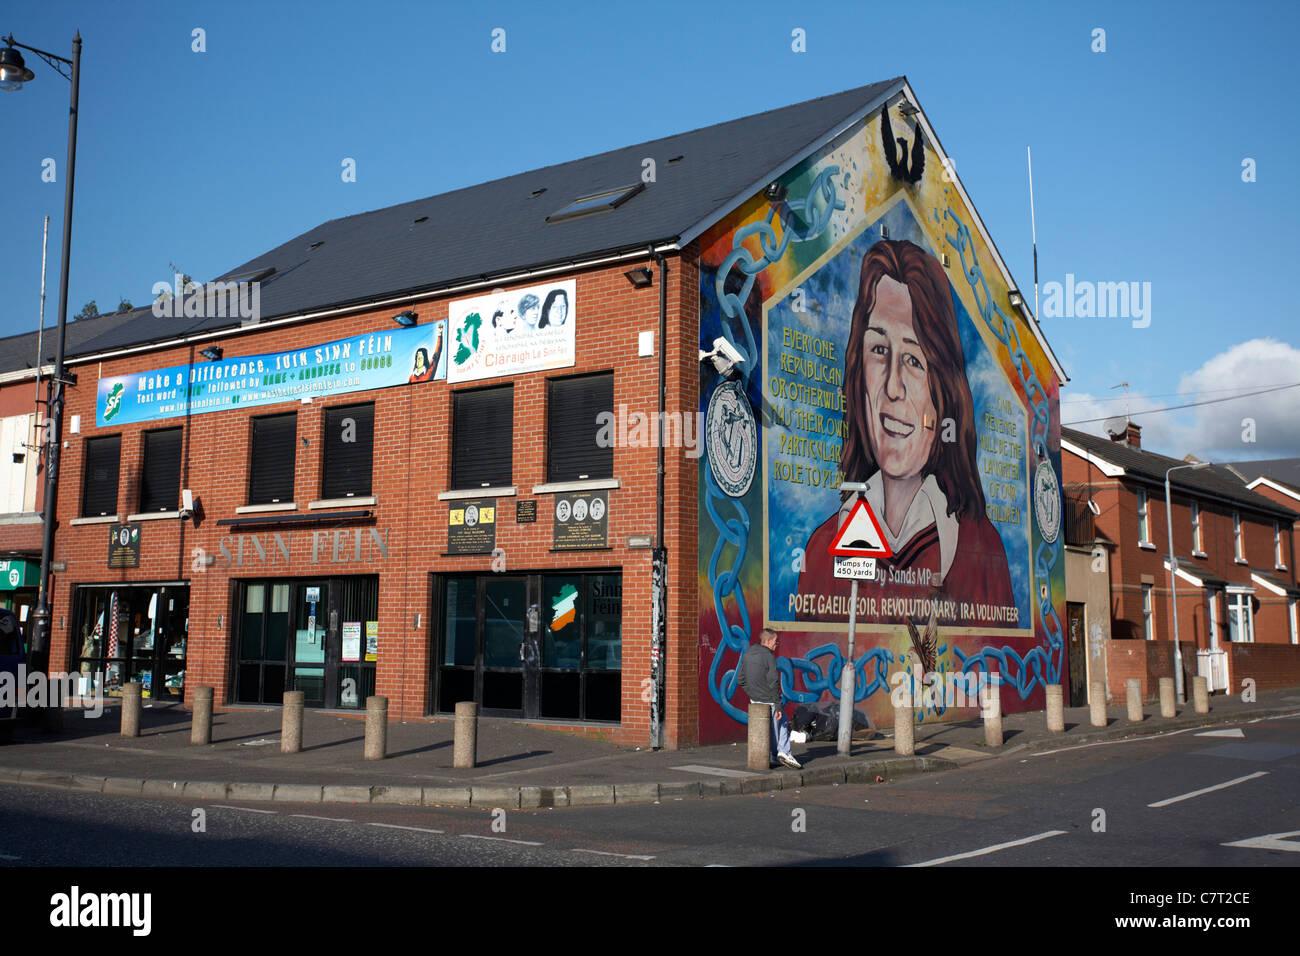 Sinn Féin Büro und Bobby Sands Wandbild, Falls Road, Belfast, Nordirland, Vereinigtes Königreich. Stockbild